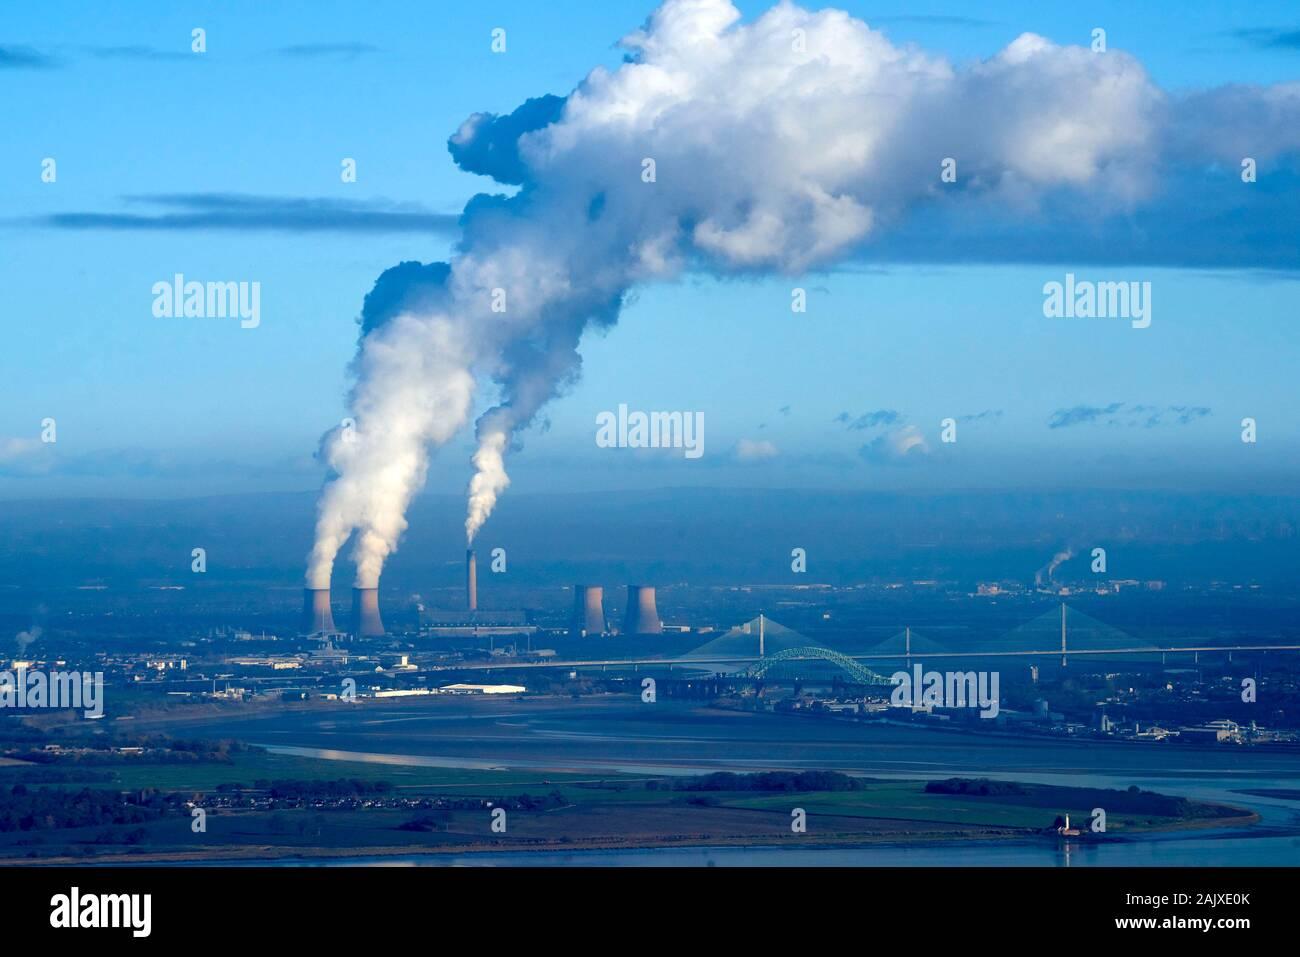 Fumi inquinanti drifting sud in inverno il sole, da Fiddlers Ferry carbone Power Station, Merseyside North West England, Regno Unito Foto Stock